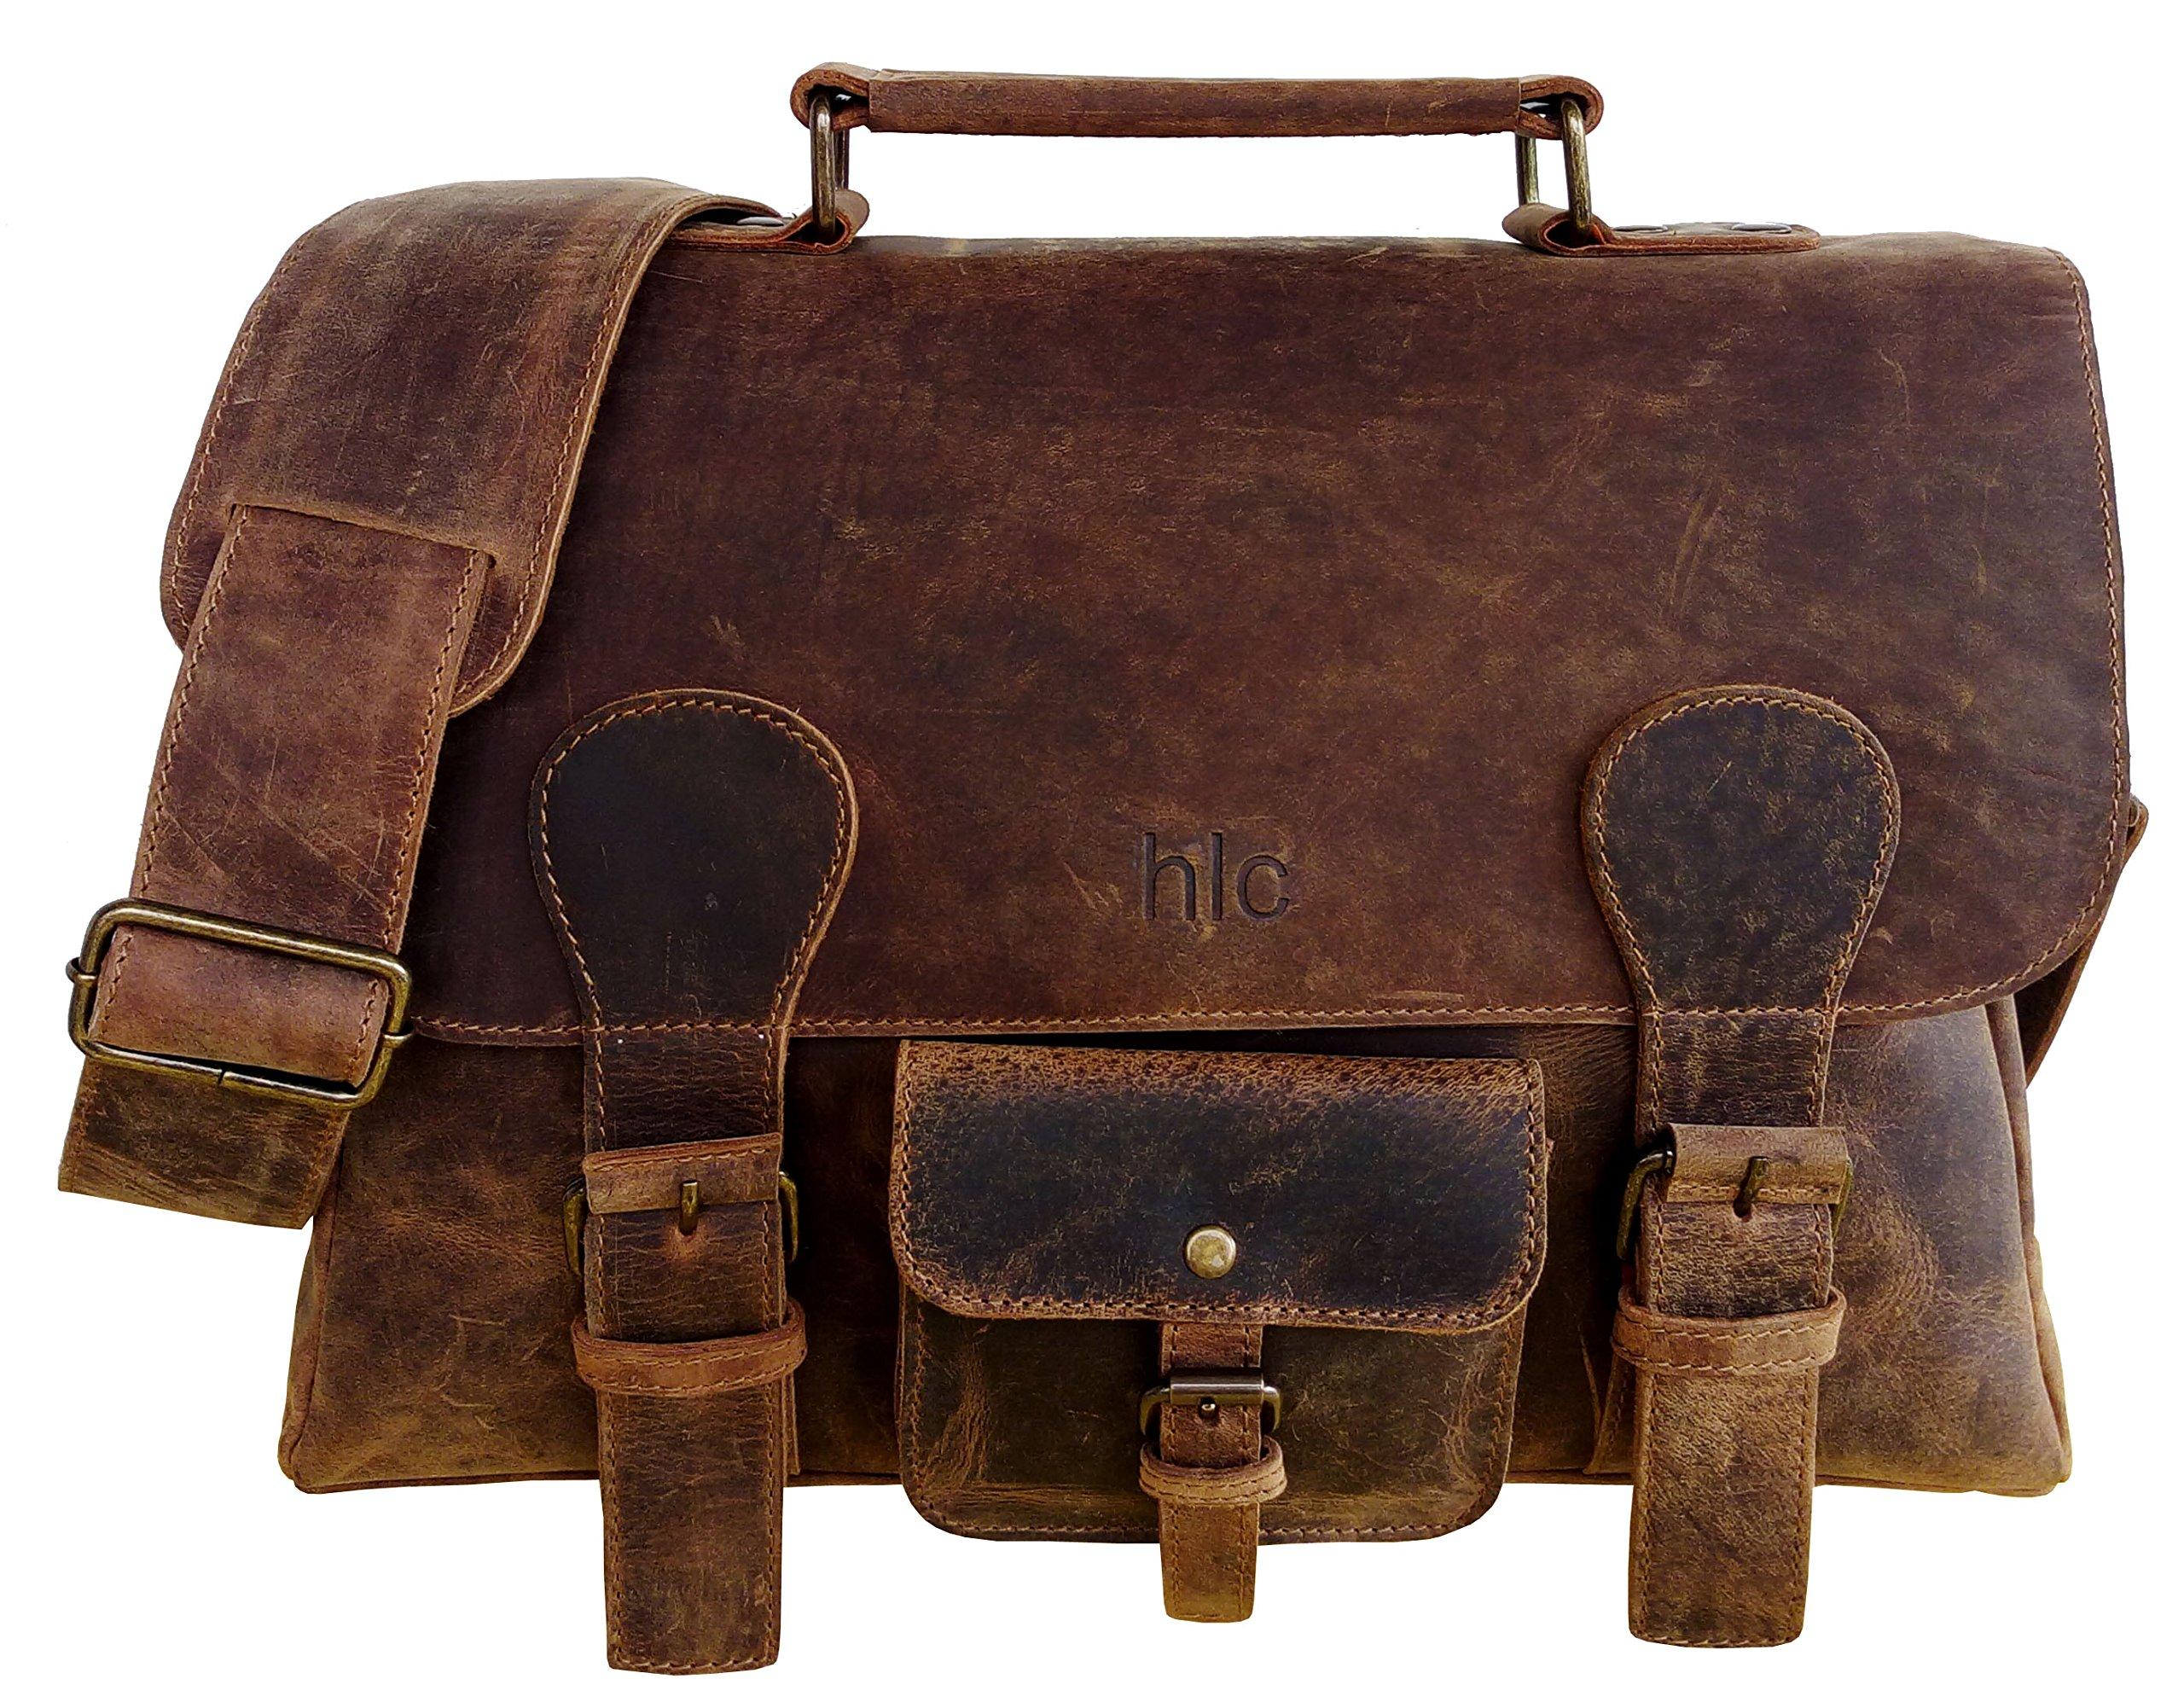 Handolederco 15.5 Inch Retro Buffalo Hunter Leather Laptop Messenger Bag Office Briefcase College Bag